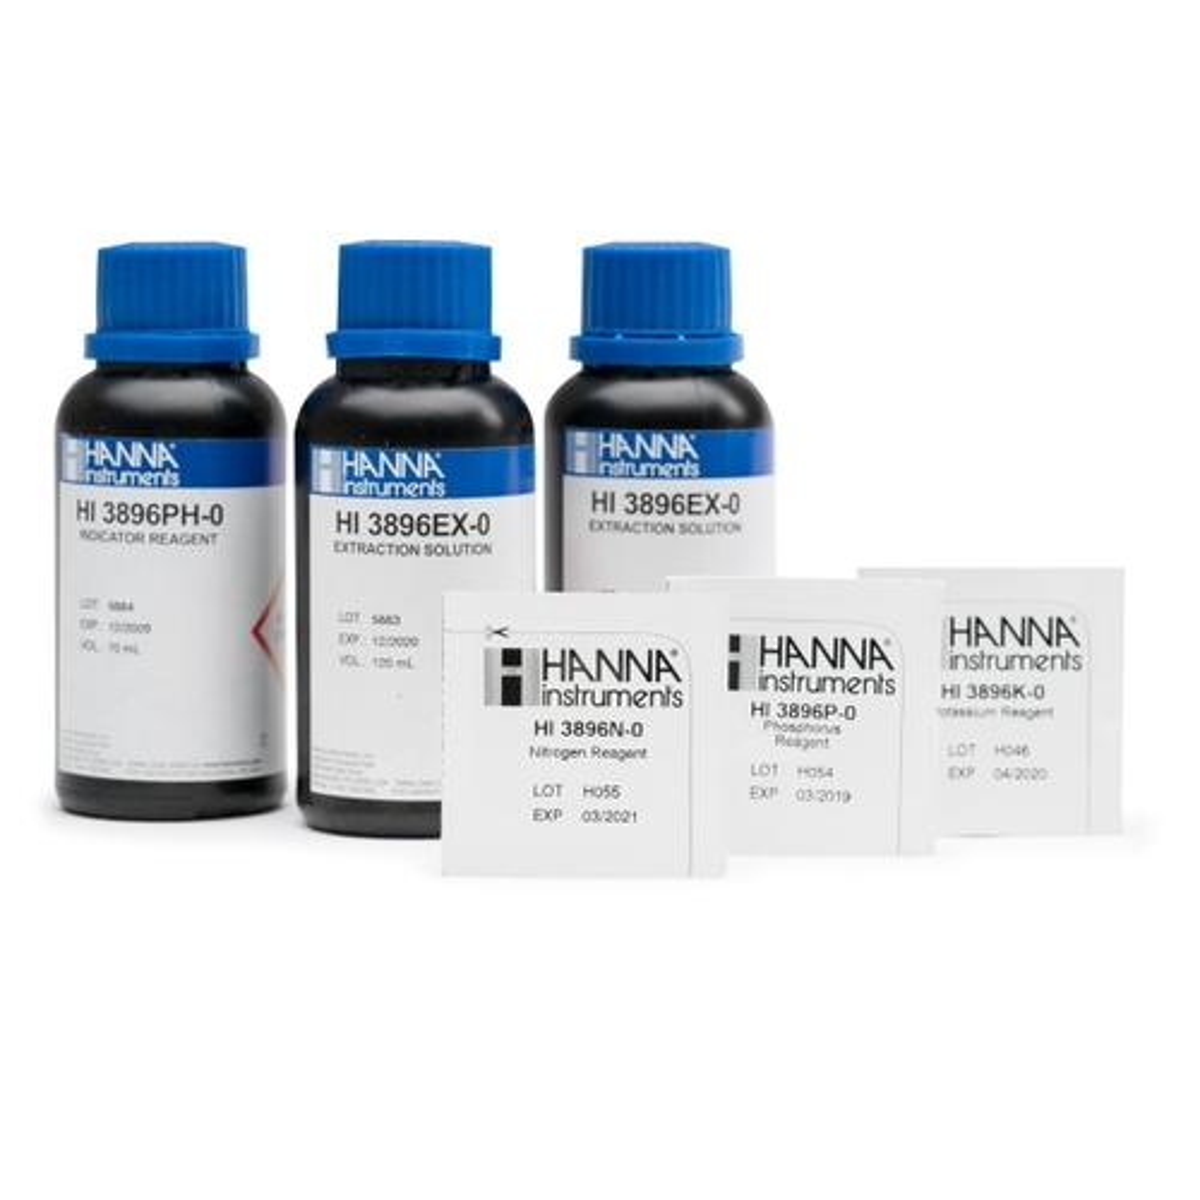 NPK Soil Chemical Test Kit Replacement Reagents (25 tests each) - HI3896-025